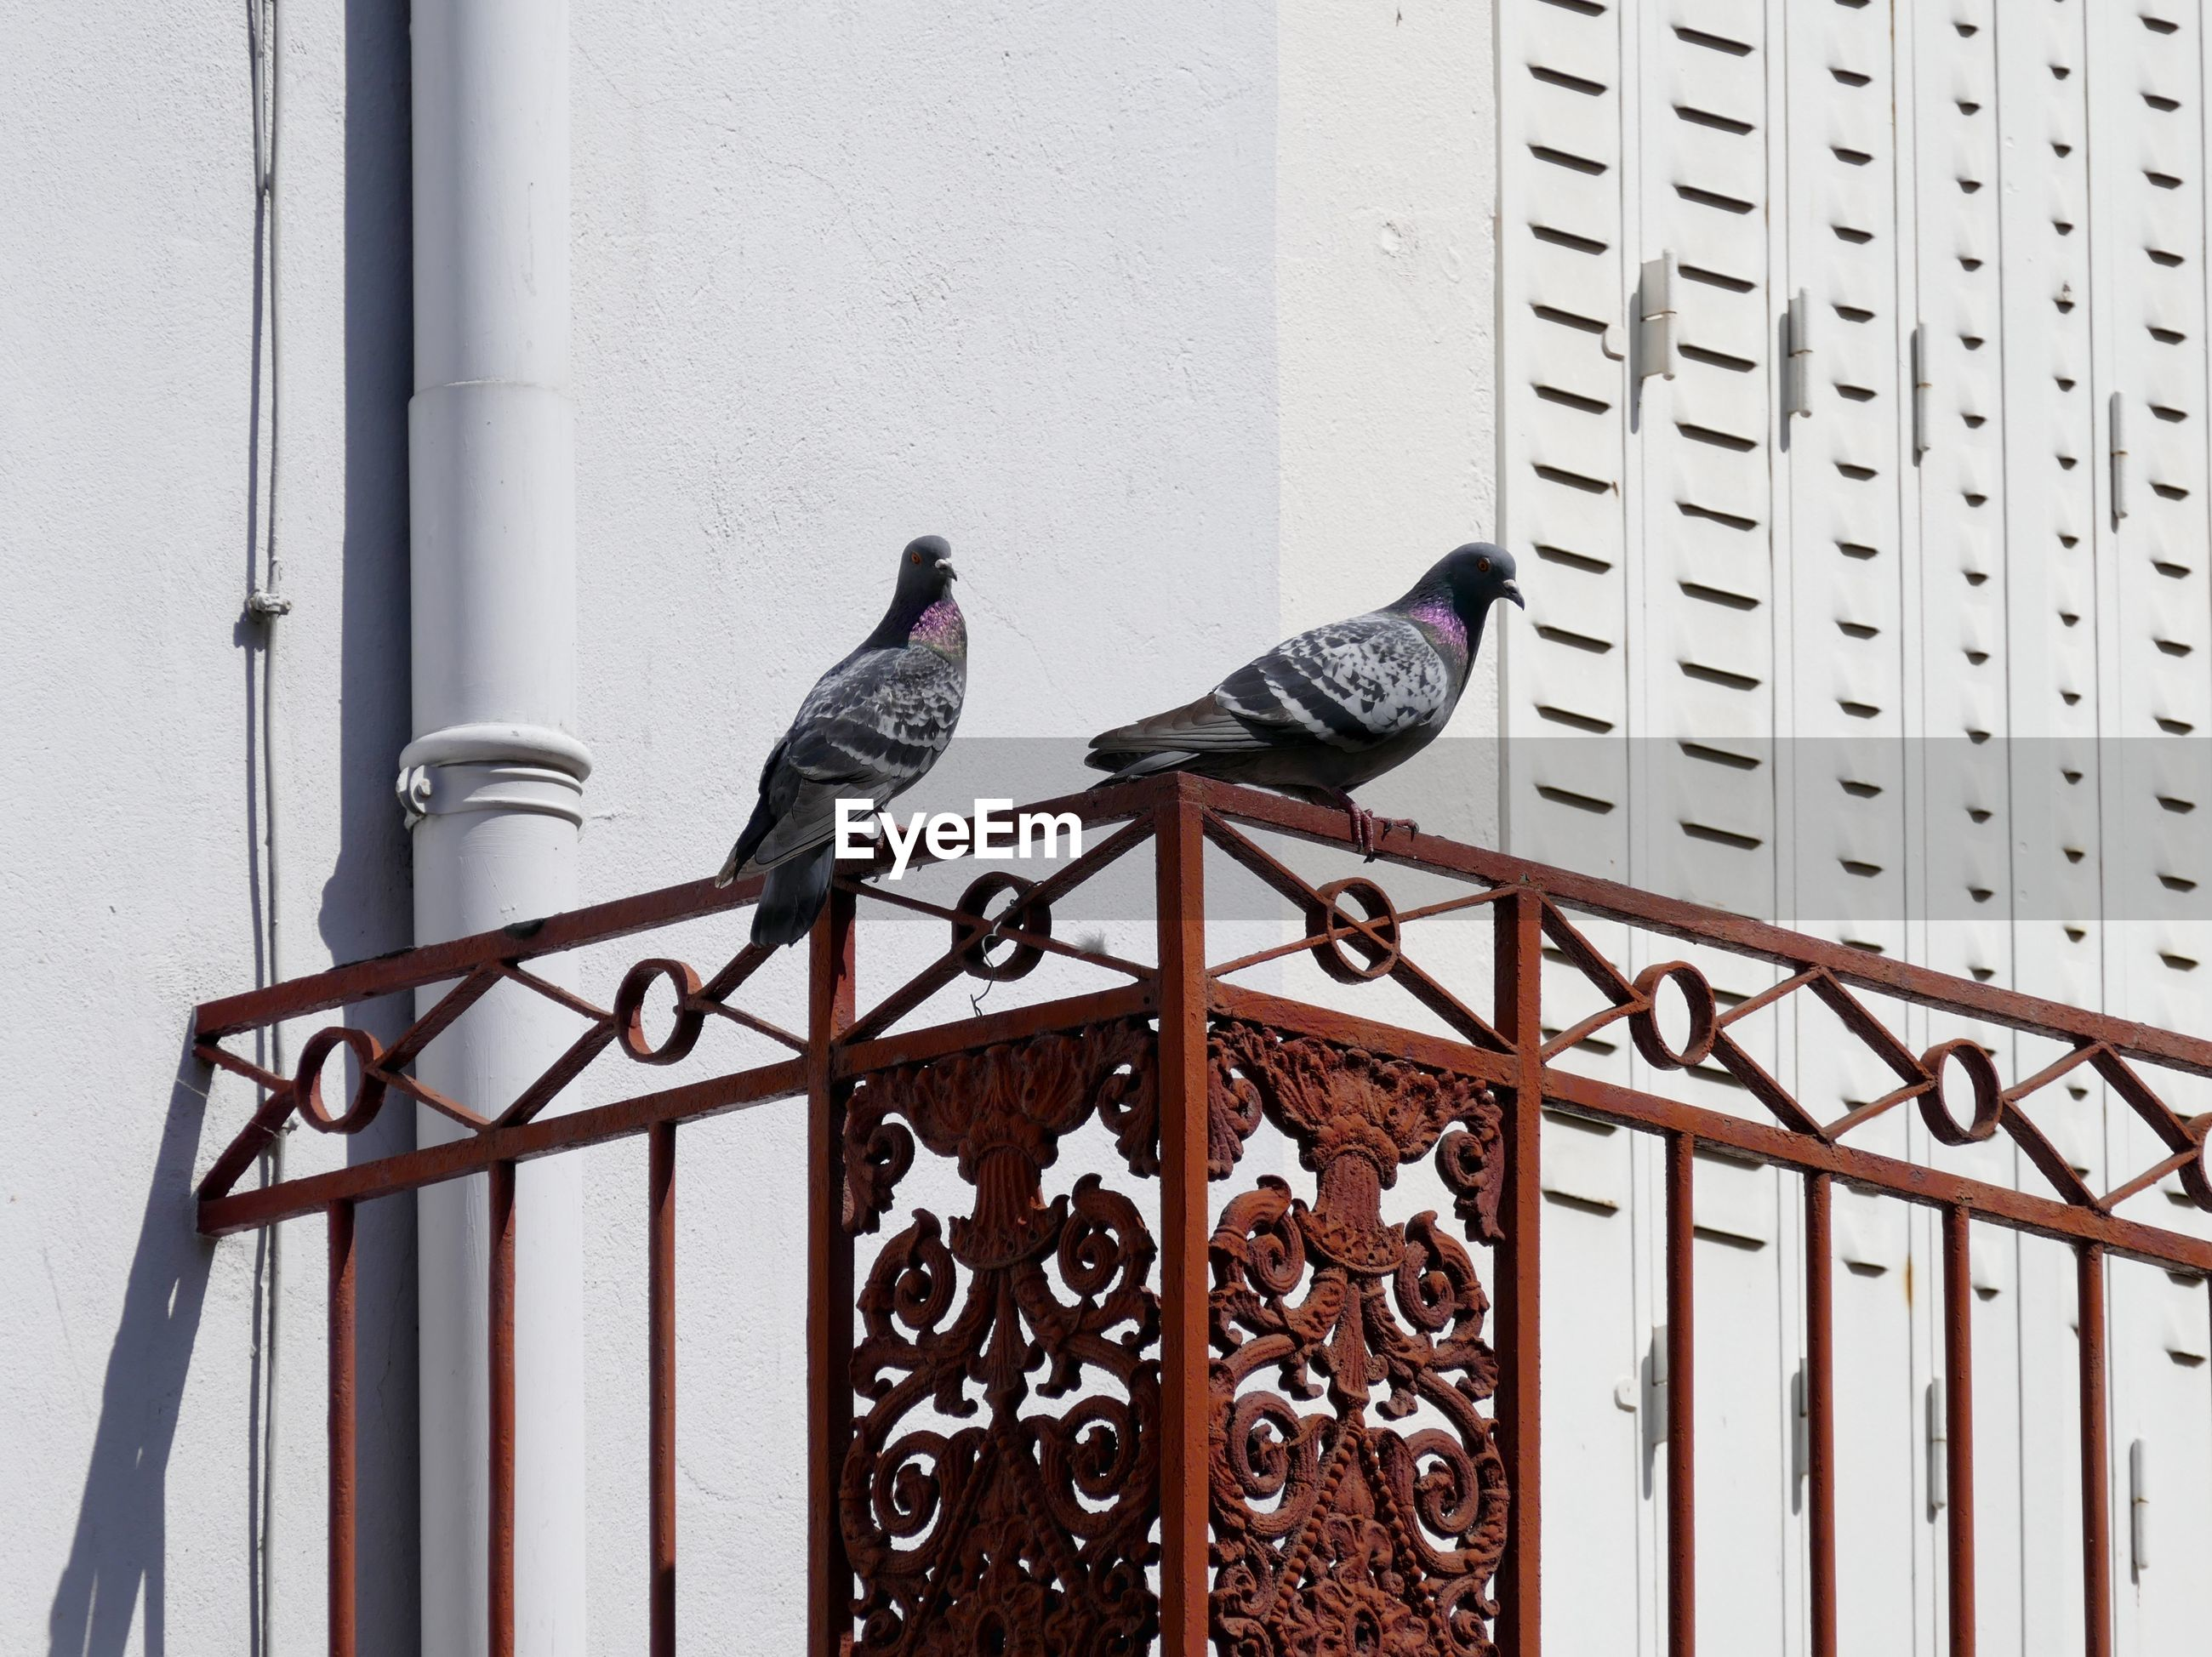 Two pigeons on iron railing